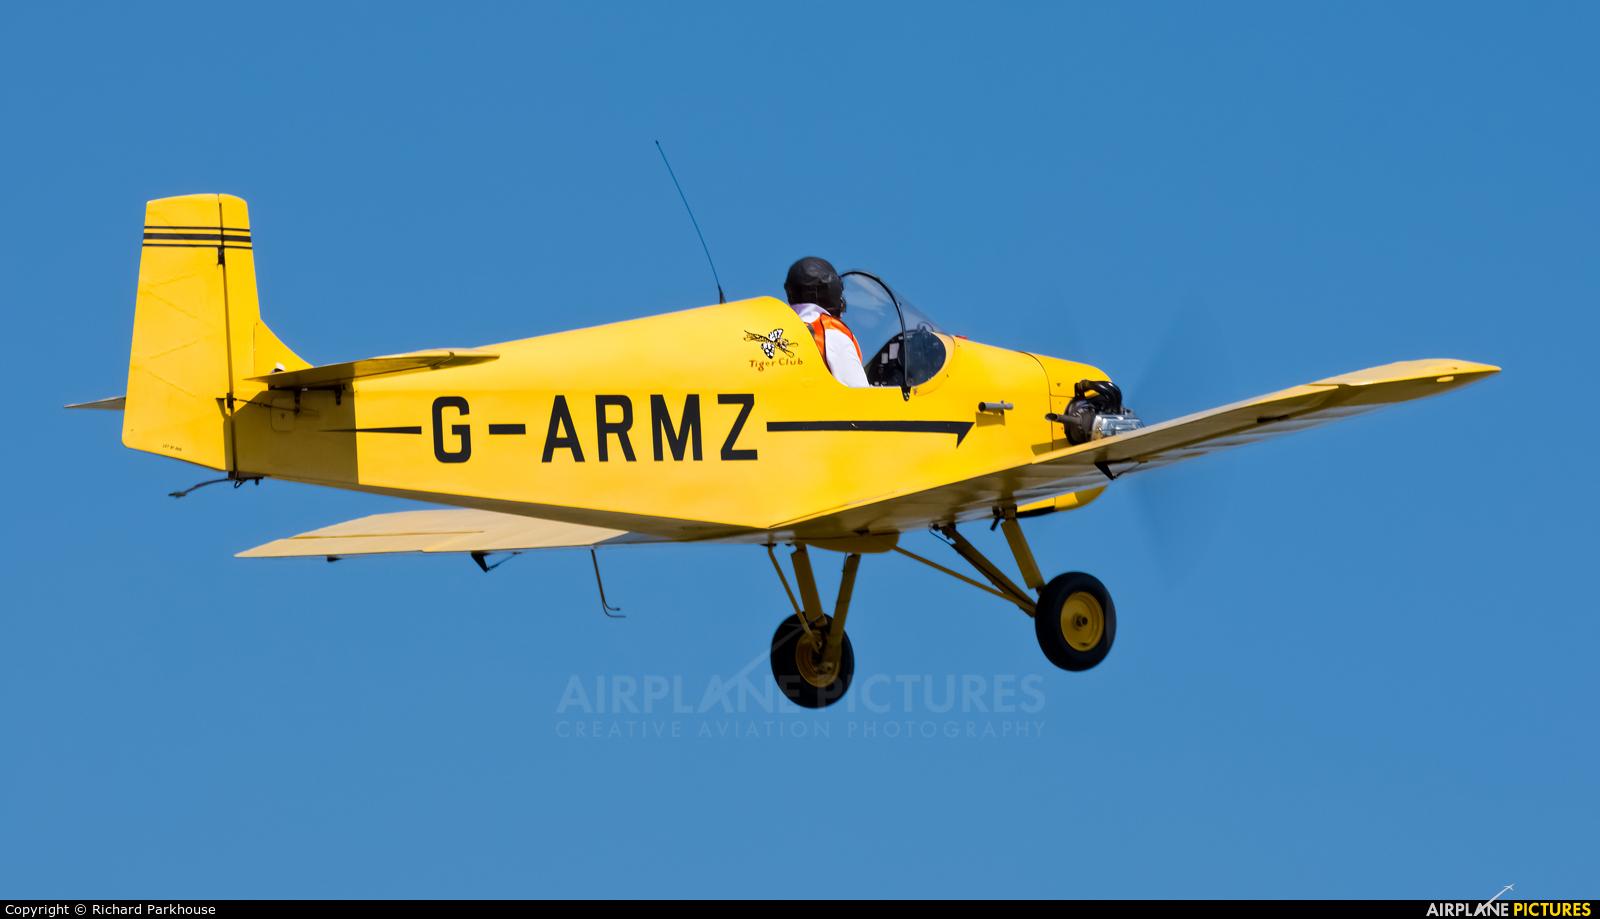 The Tiger Club G-ARMZ aircraft at Little Gransden